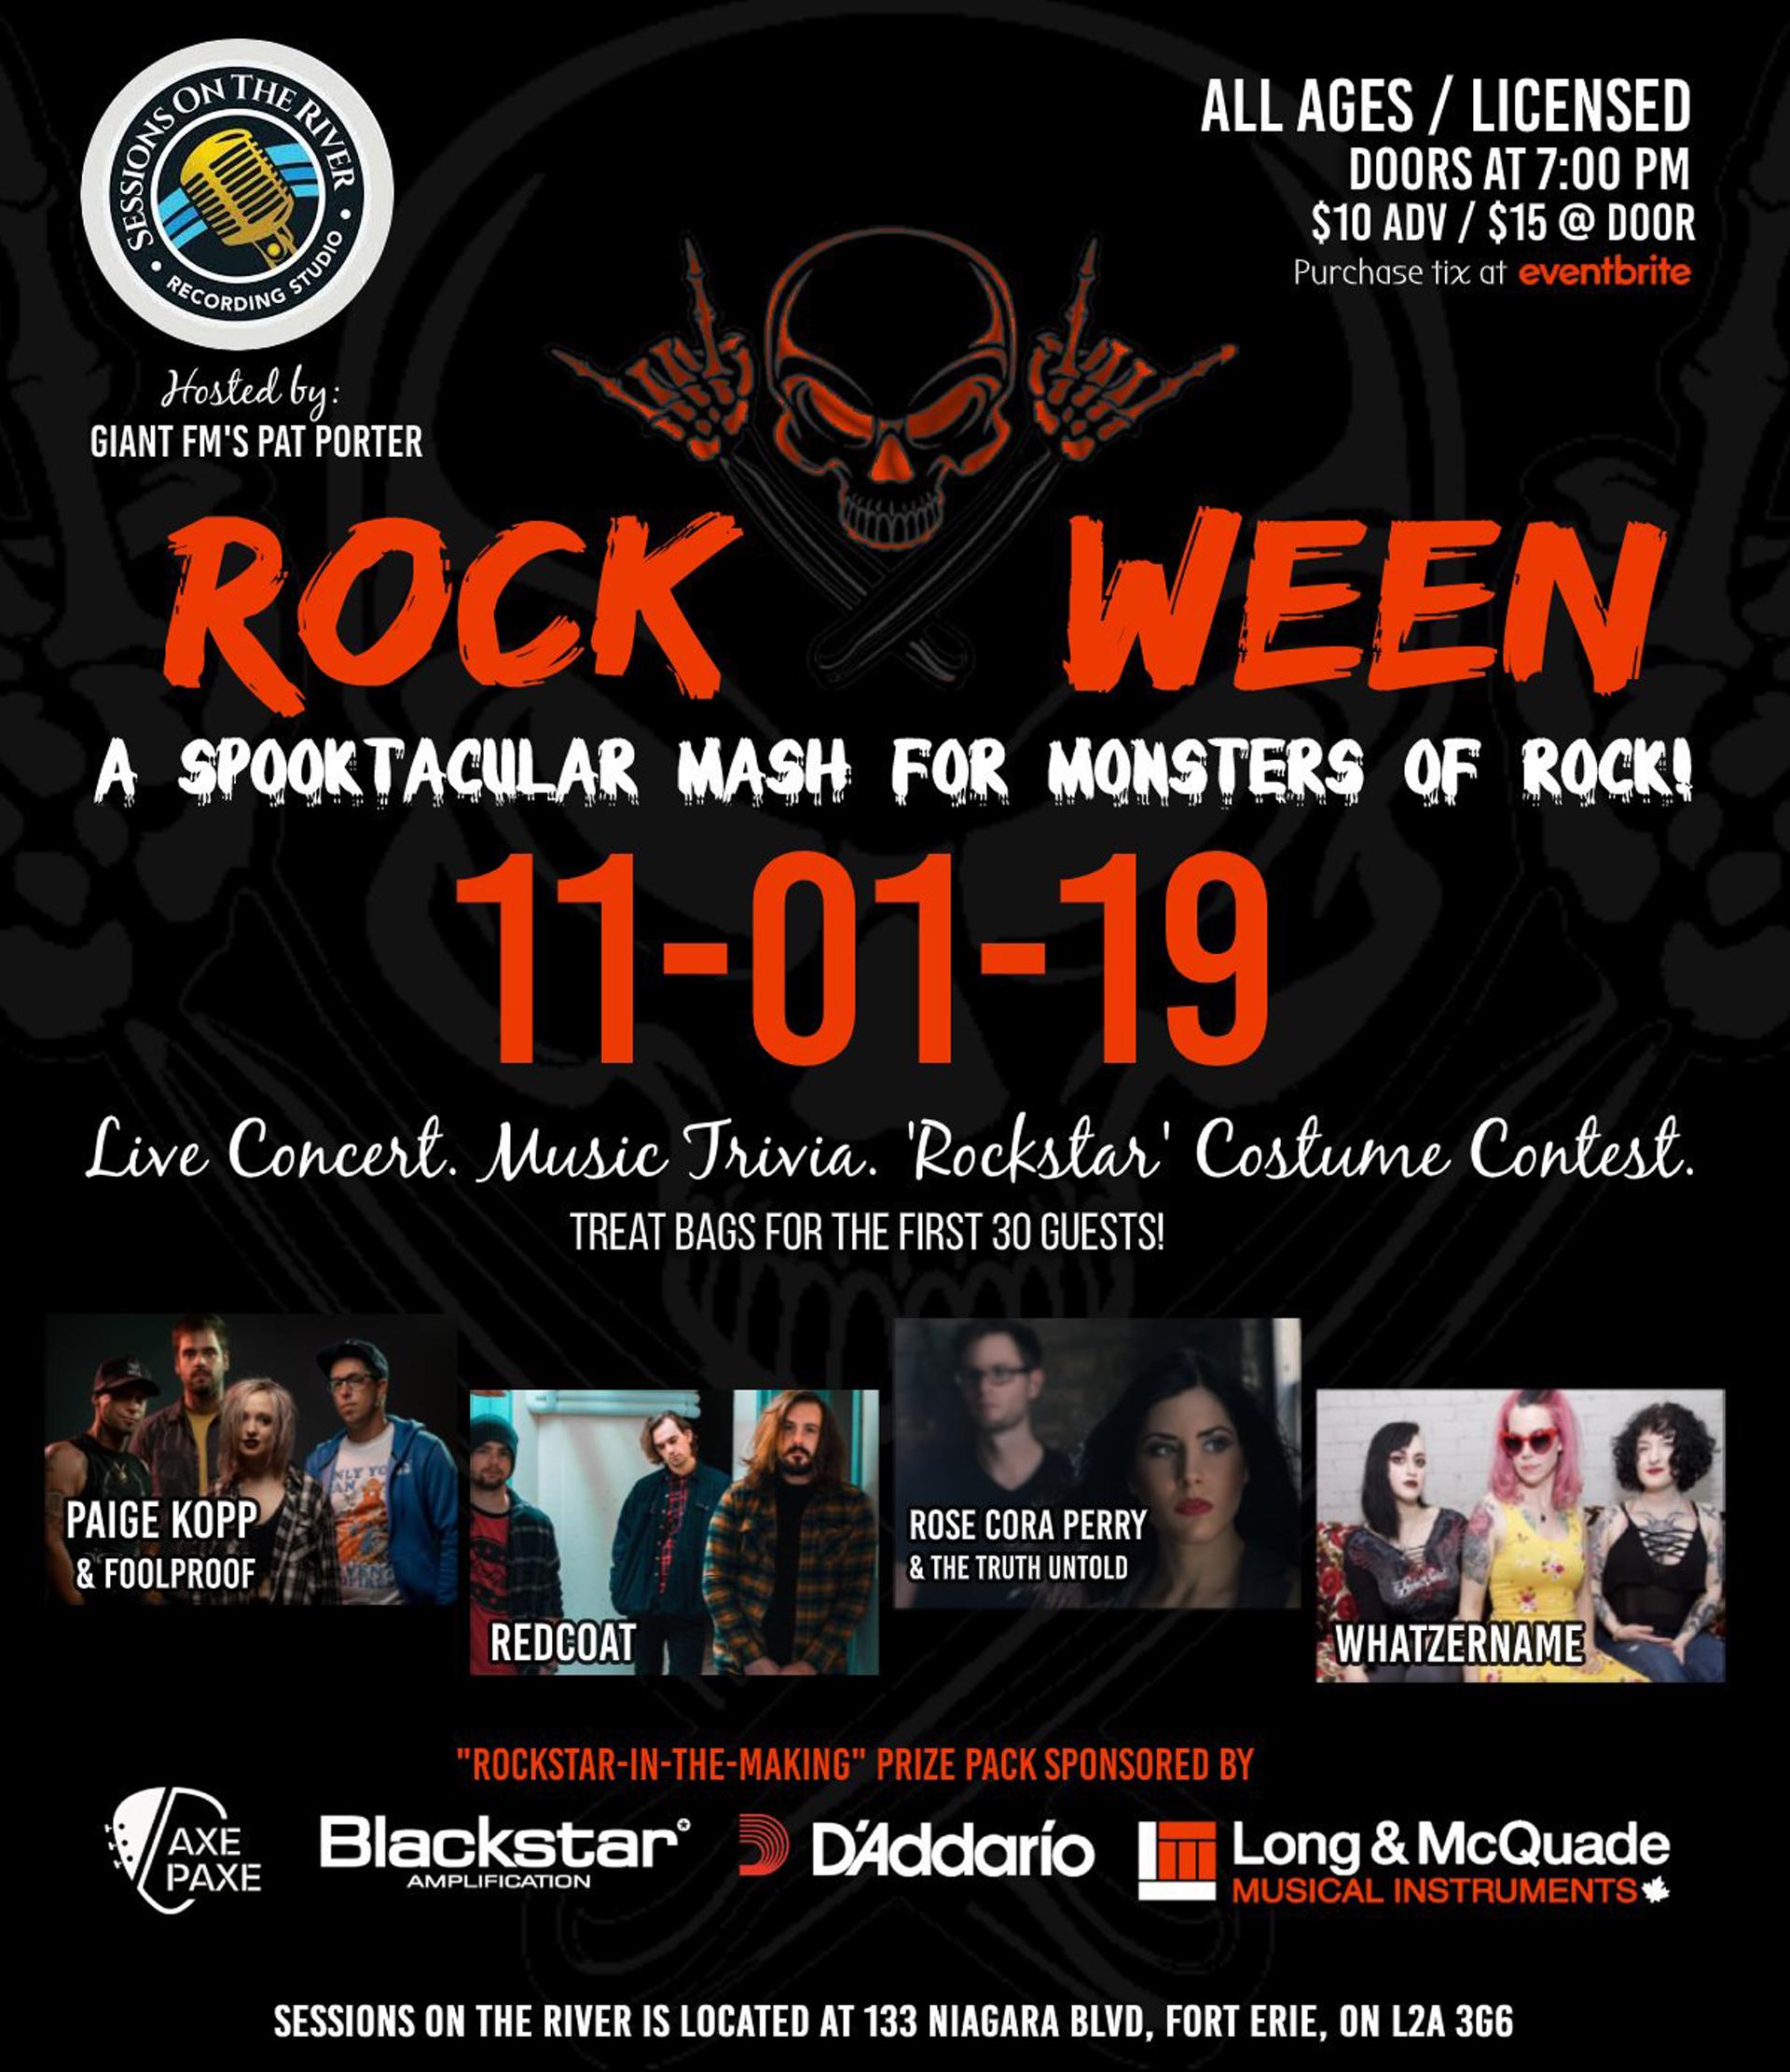 Rock-O-Ween: A Spooktacular Night Of Rock Music